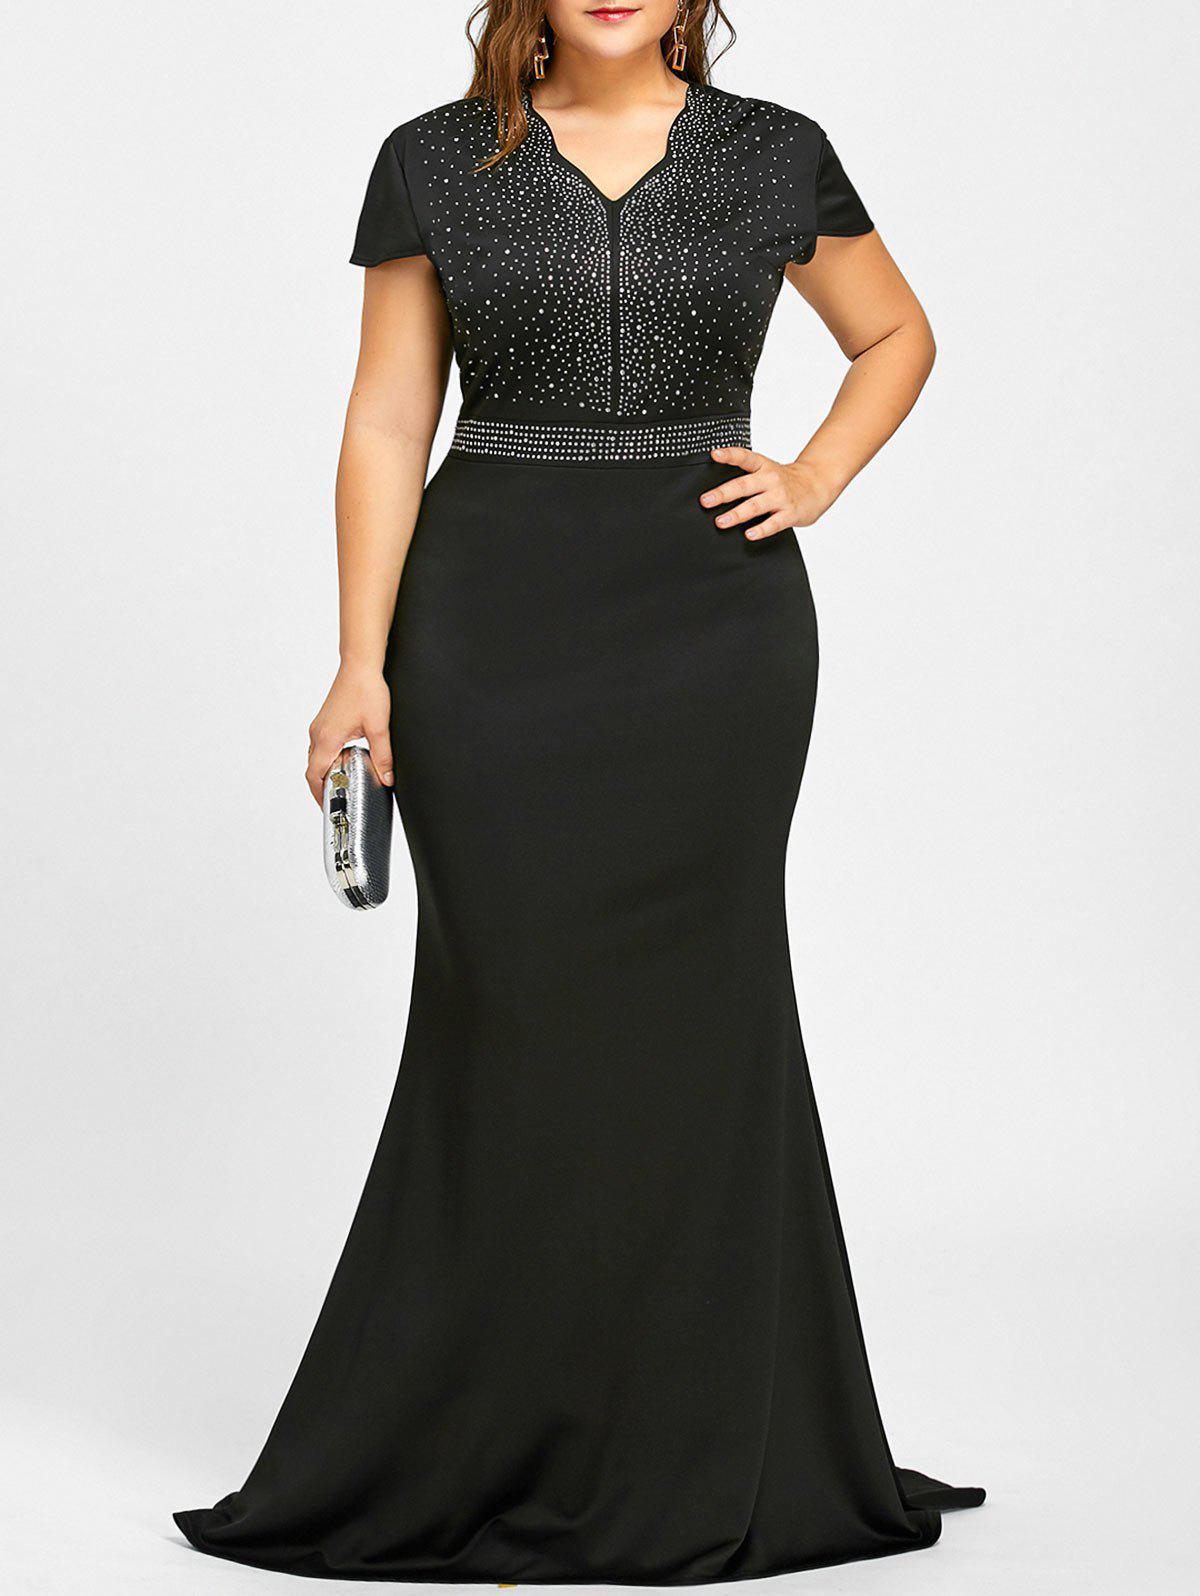 High Low Rhinestone Embellished Plus Size Dress